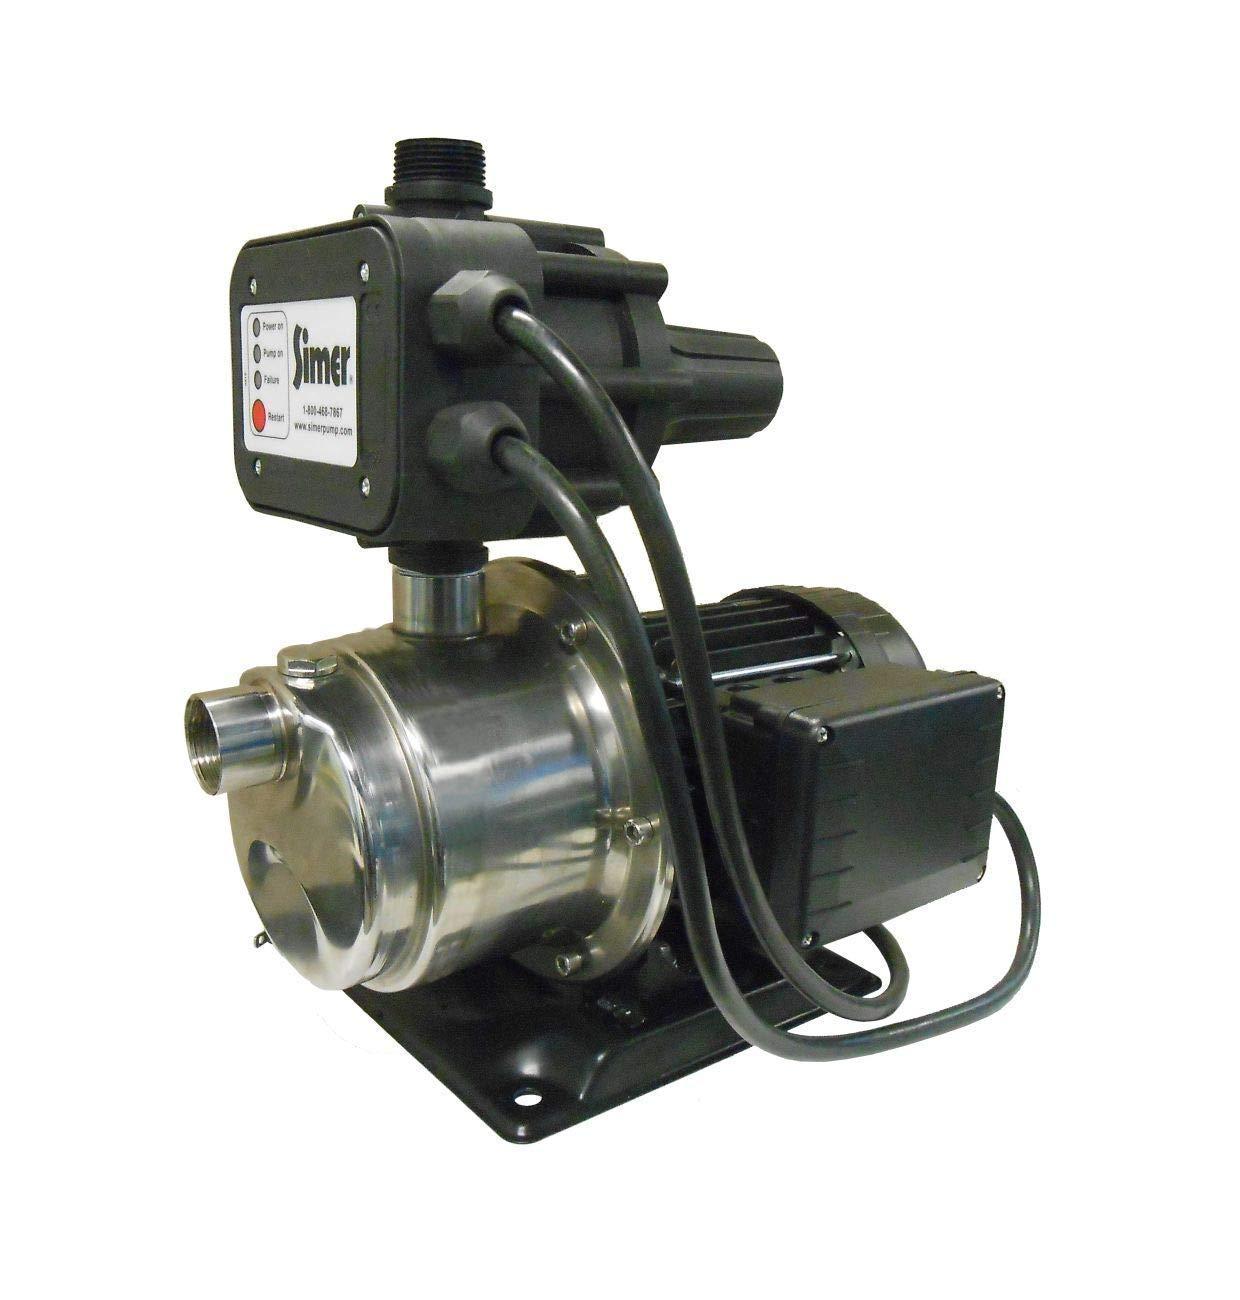 Simer 4075SS-01 3/4 HP Pressure Booster Pump by Simer